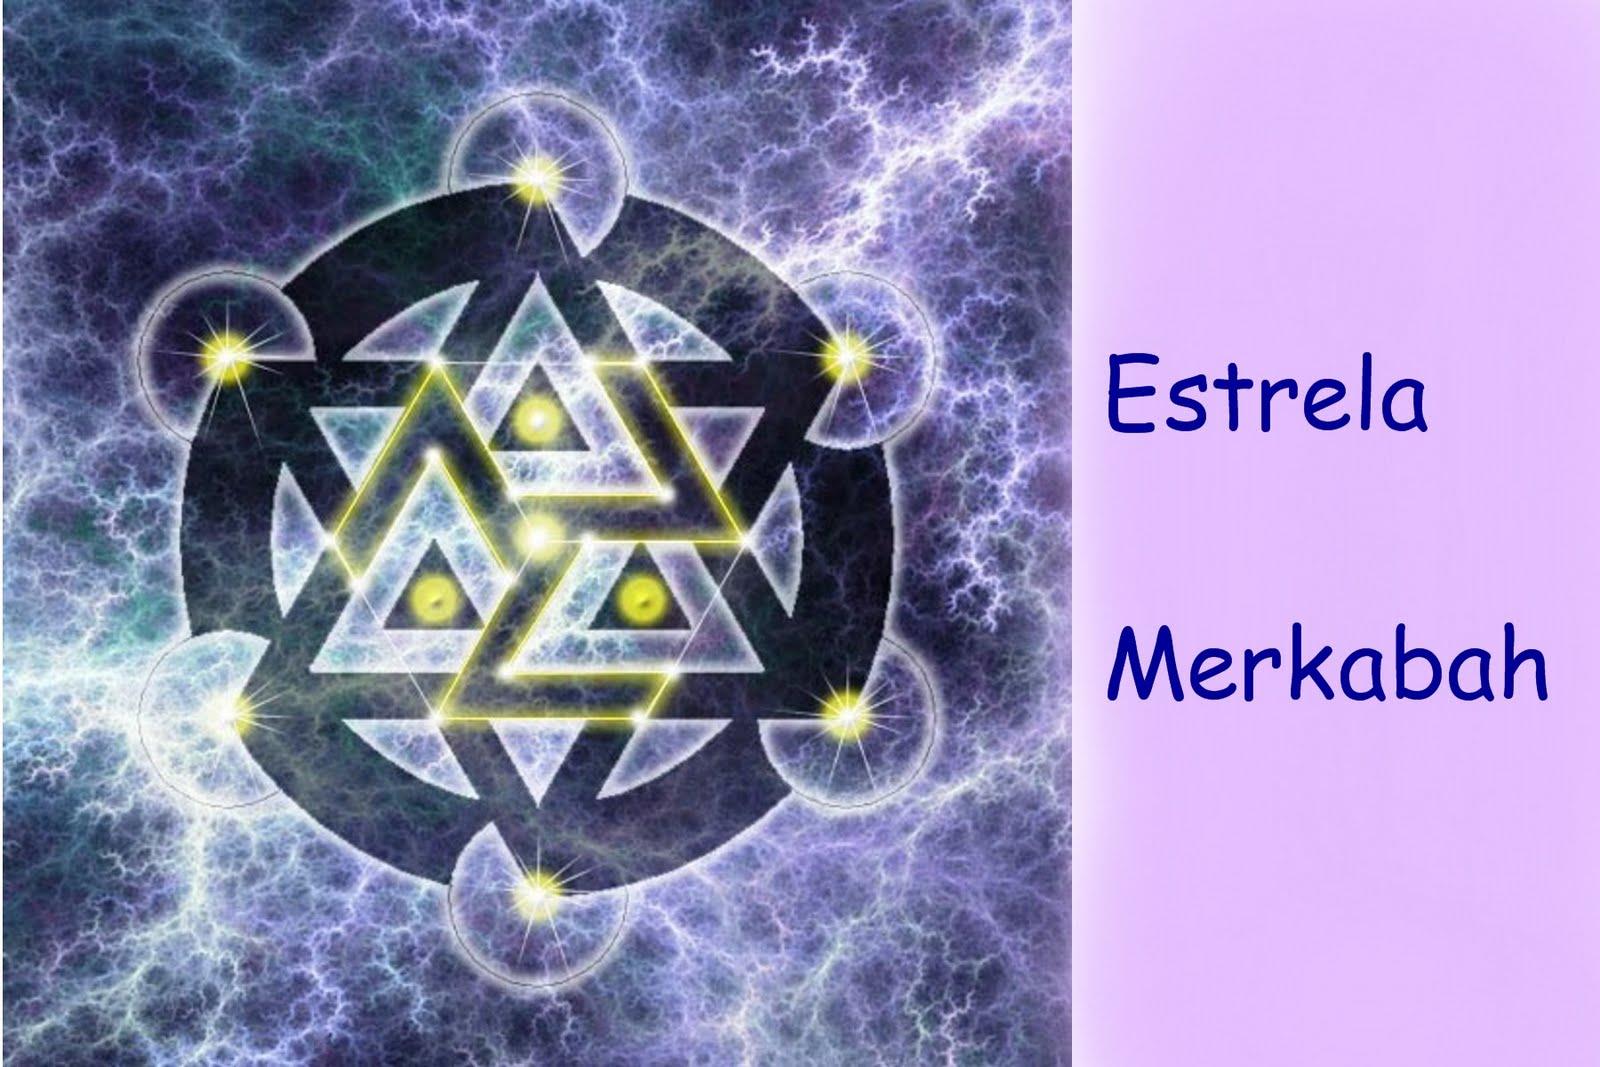 Estrela Merkabah